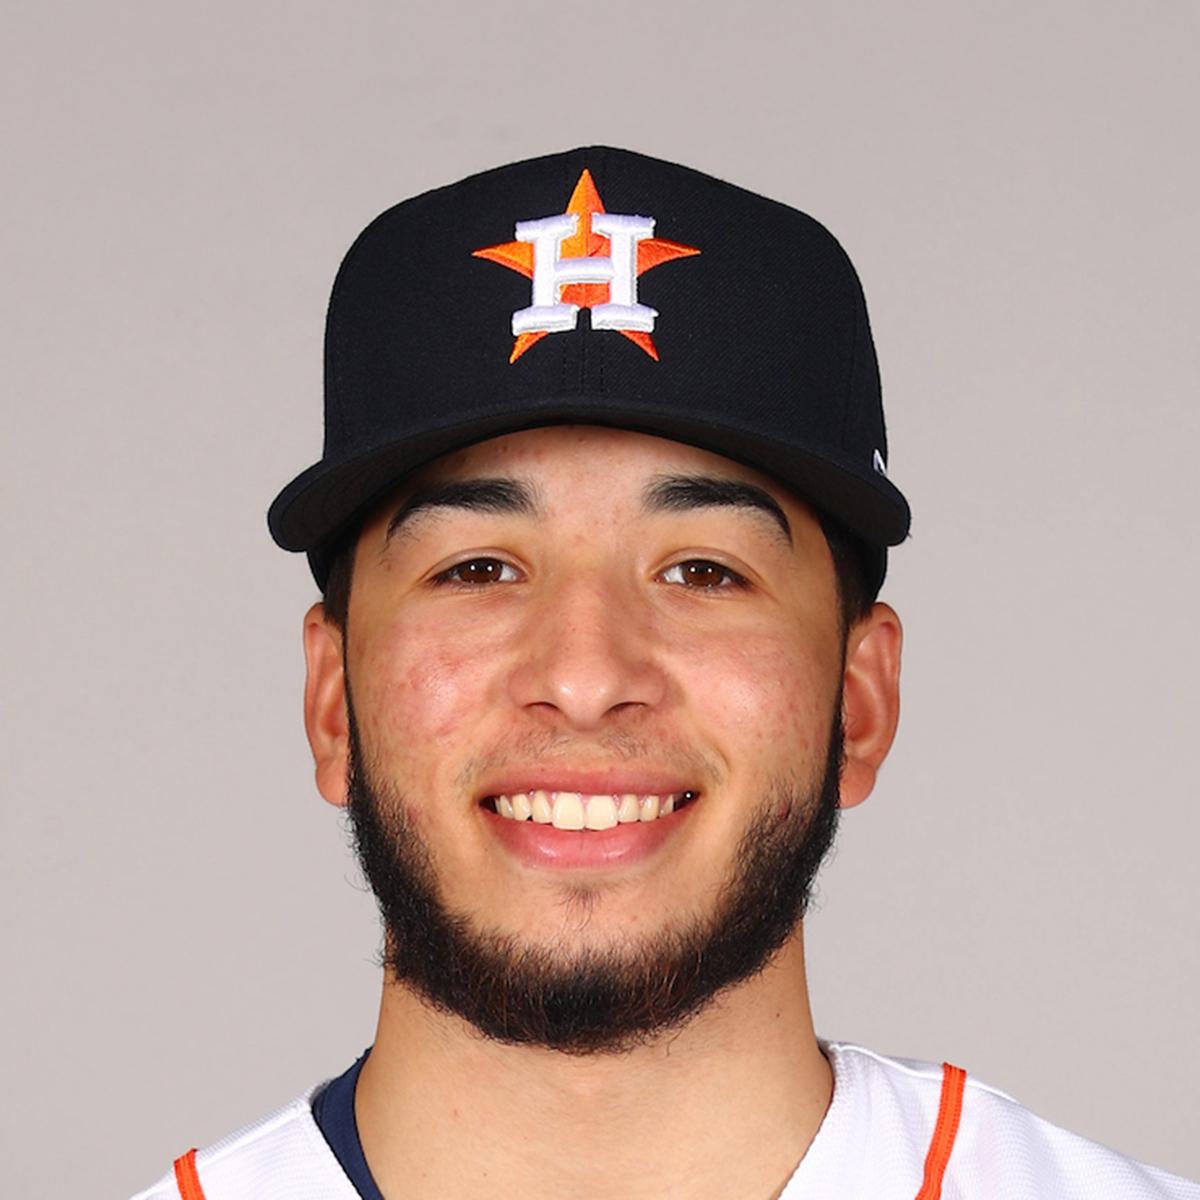 MLB: Player Headshots 2021